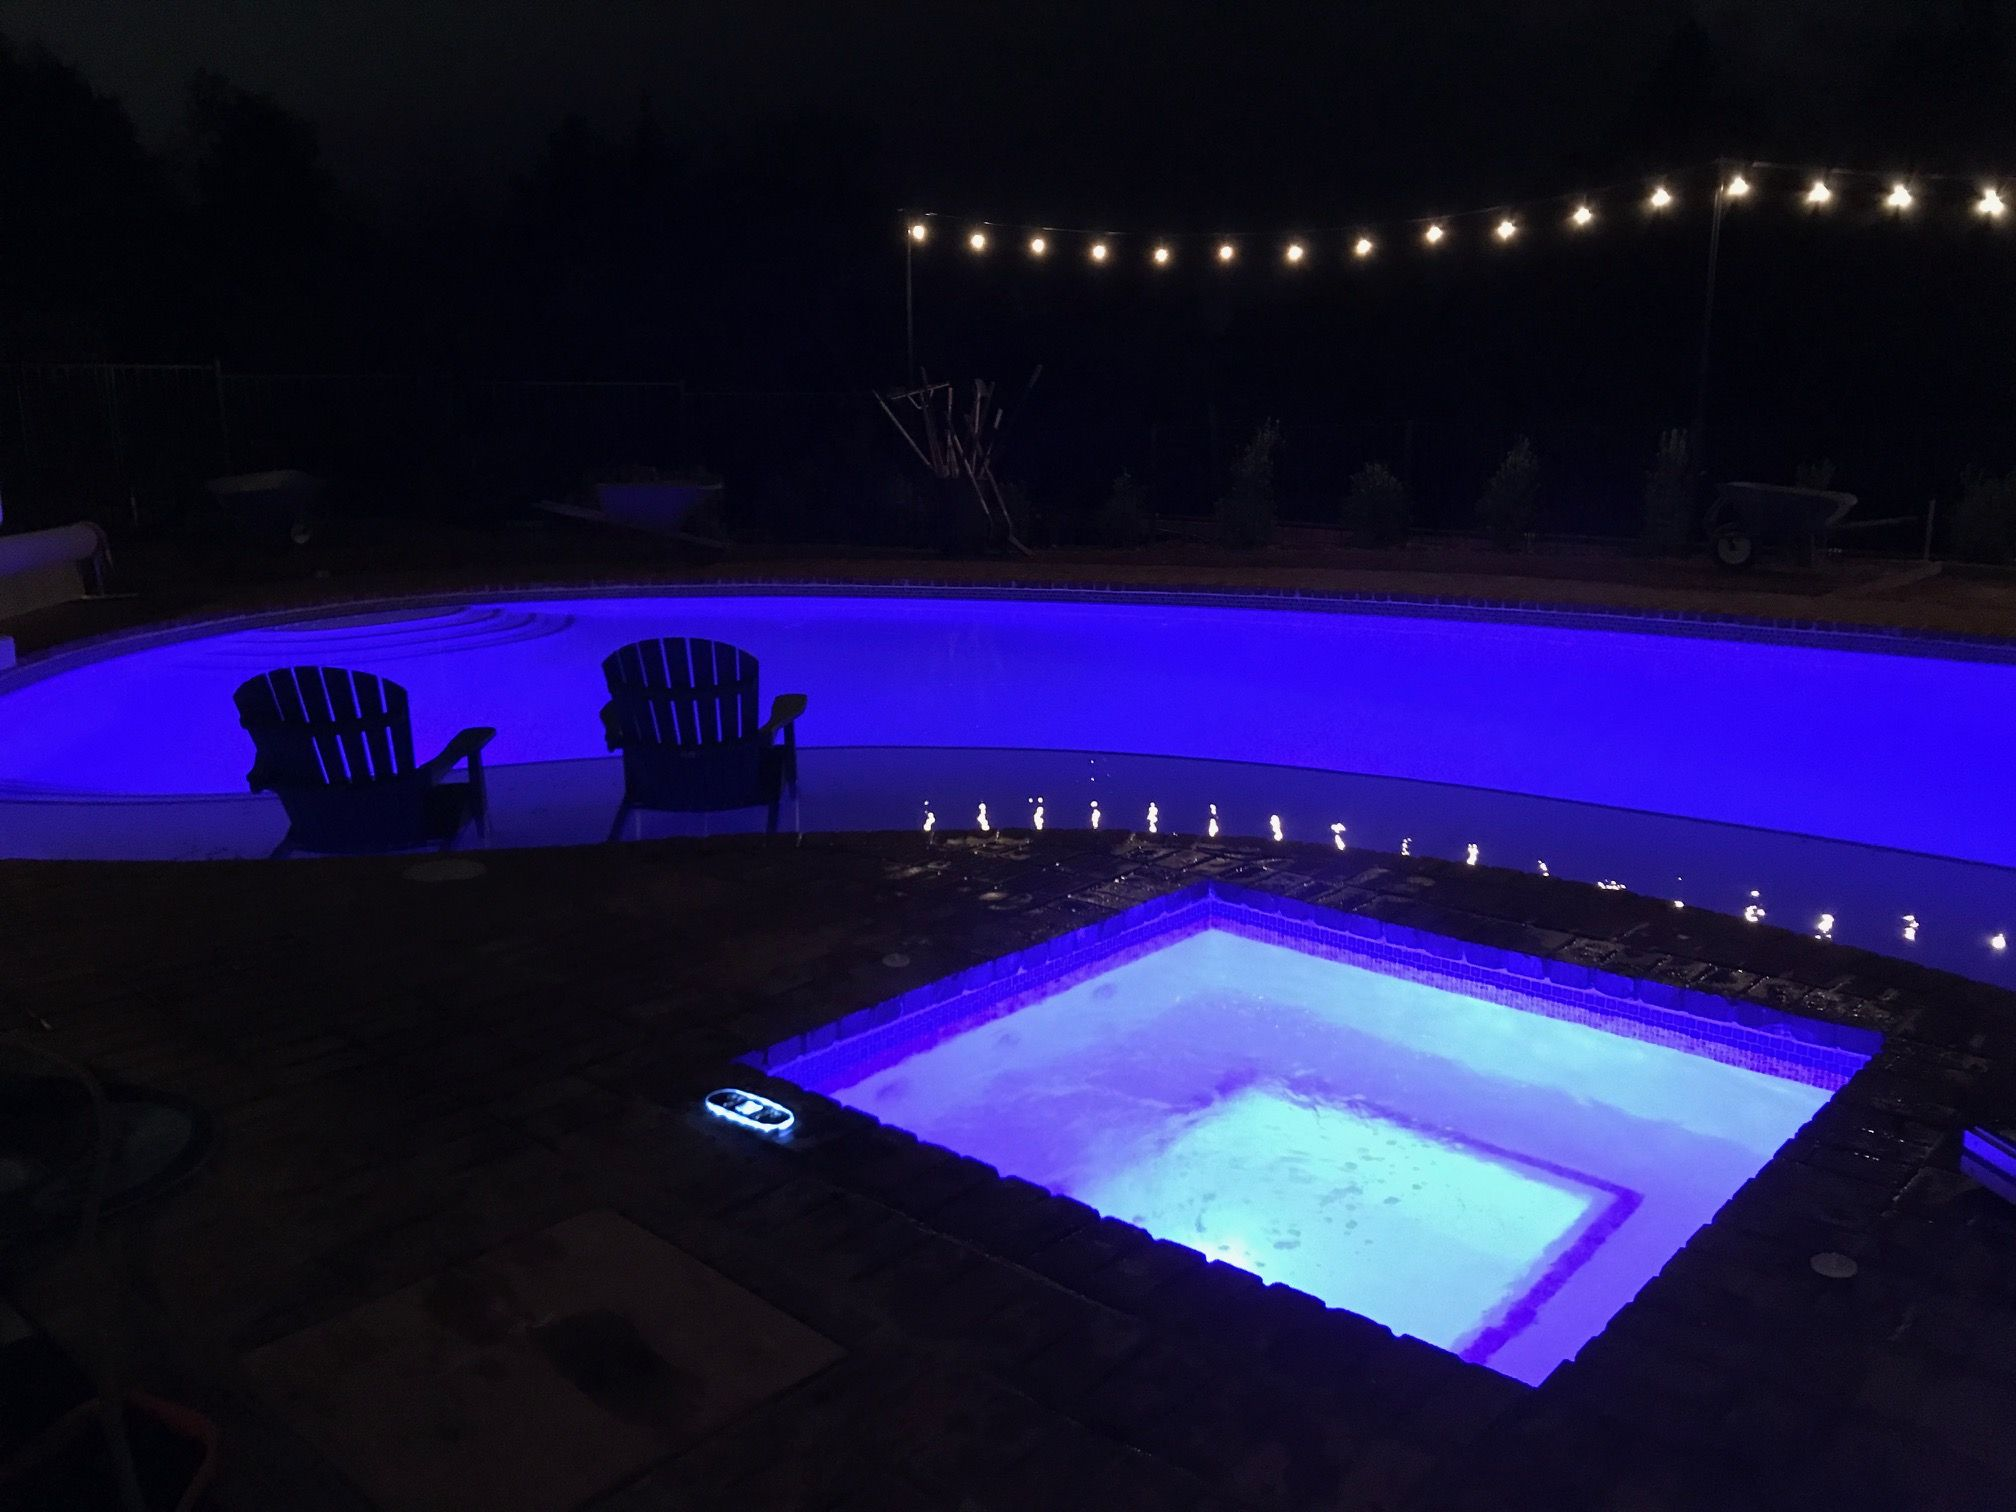 DIY Hot tub in a Pool in 2020 Hot tub, Diy hot tub, Pool